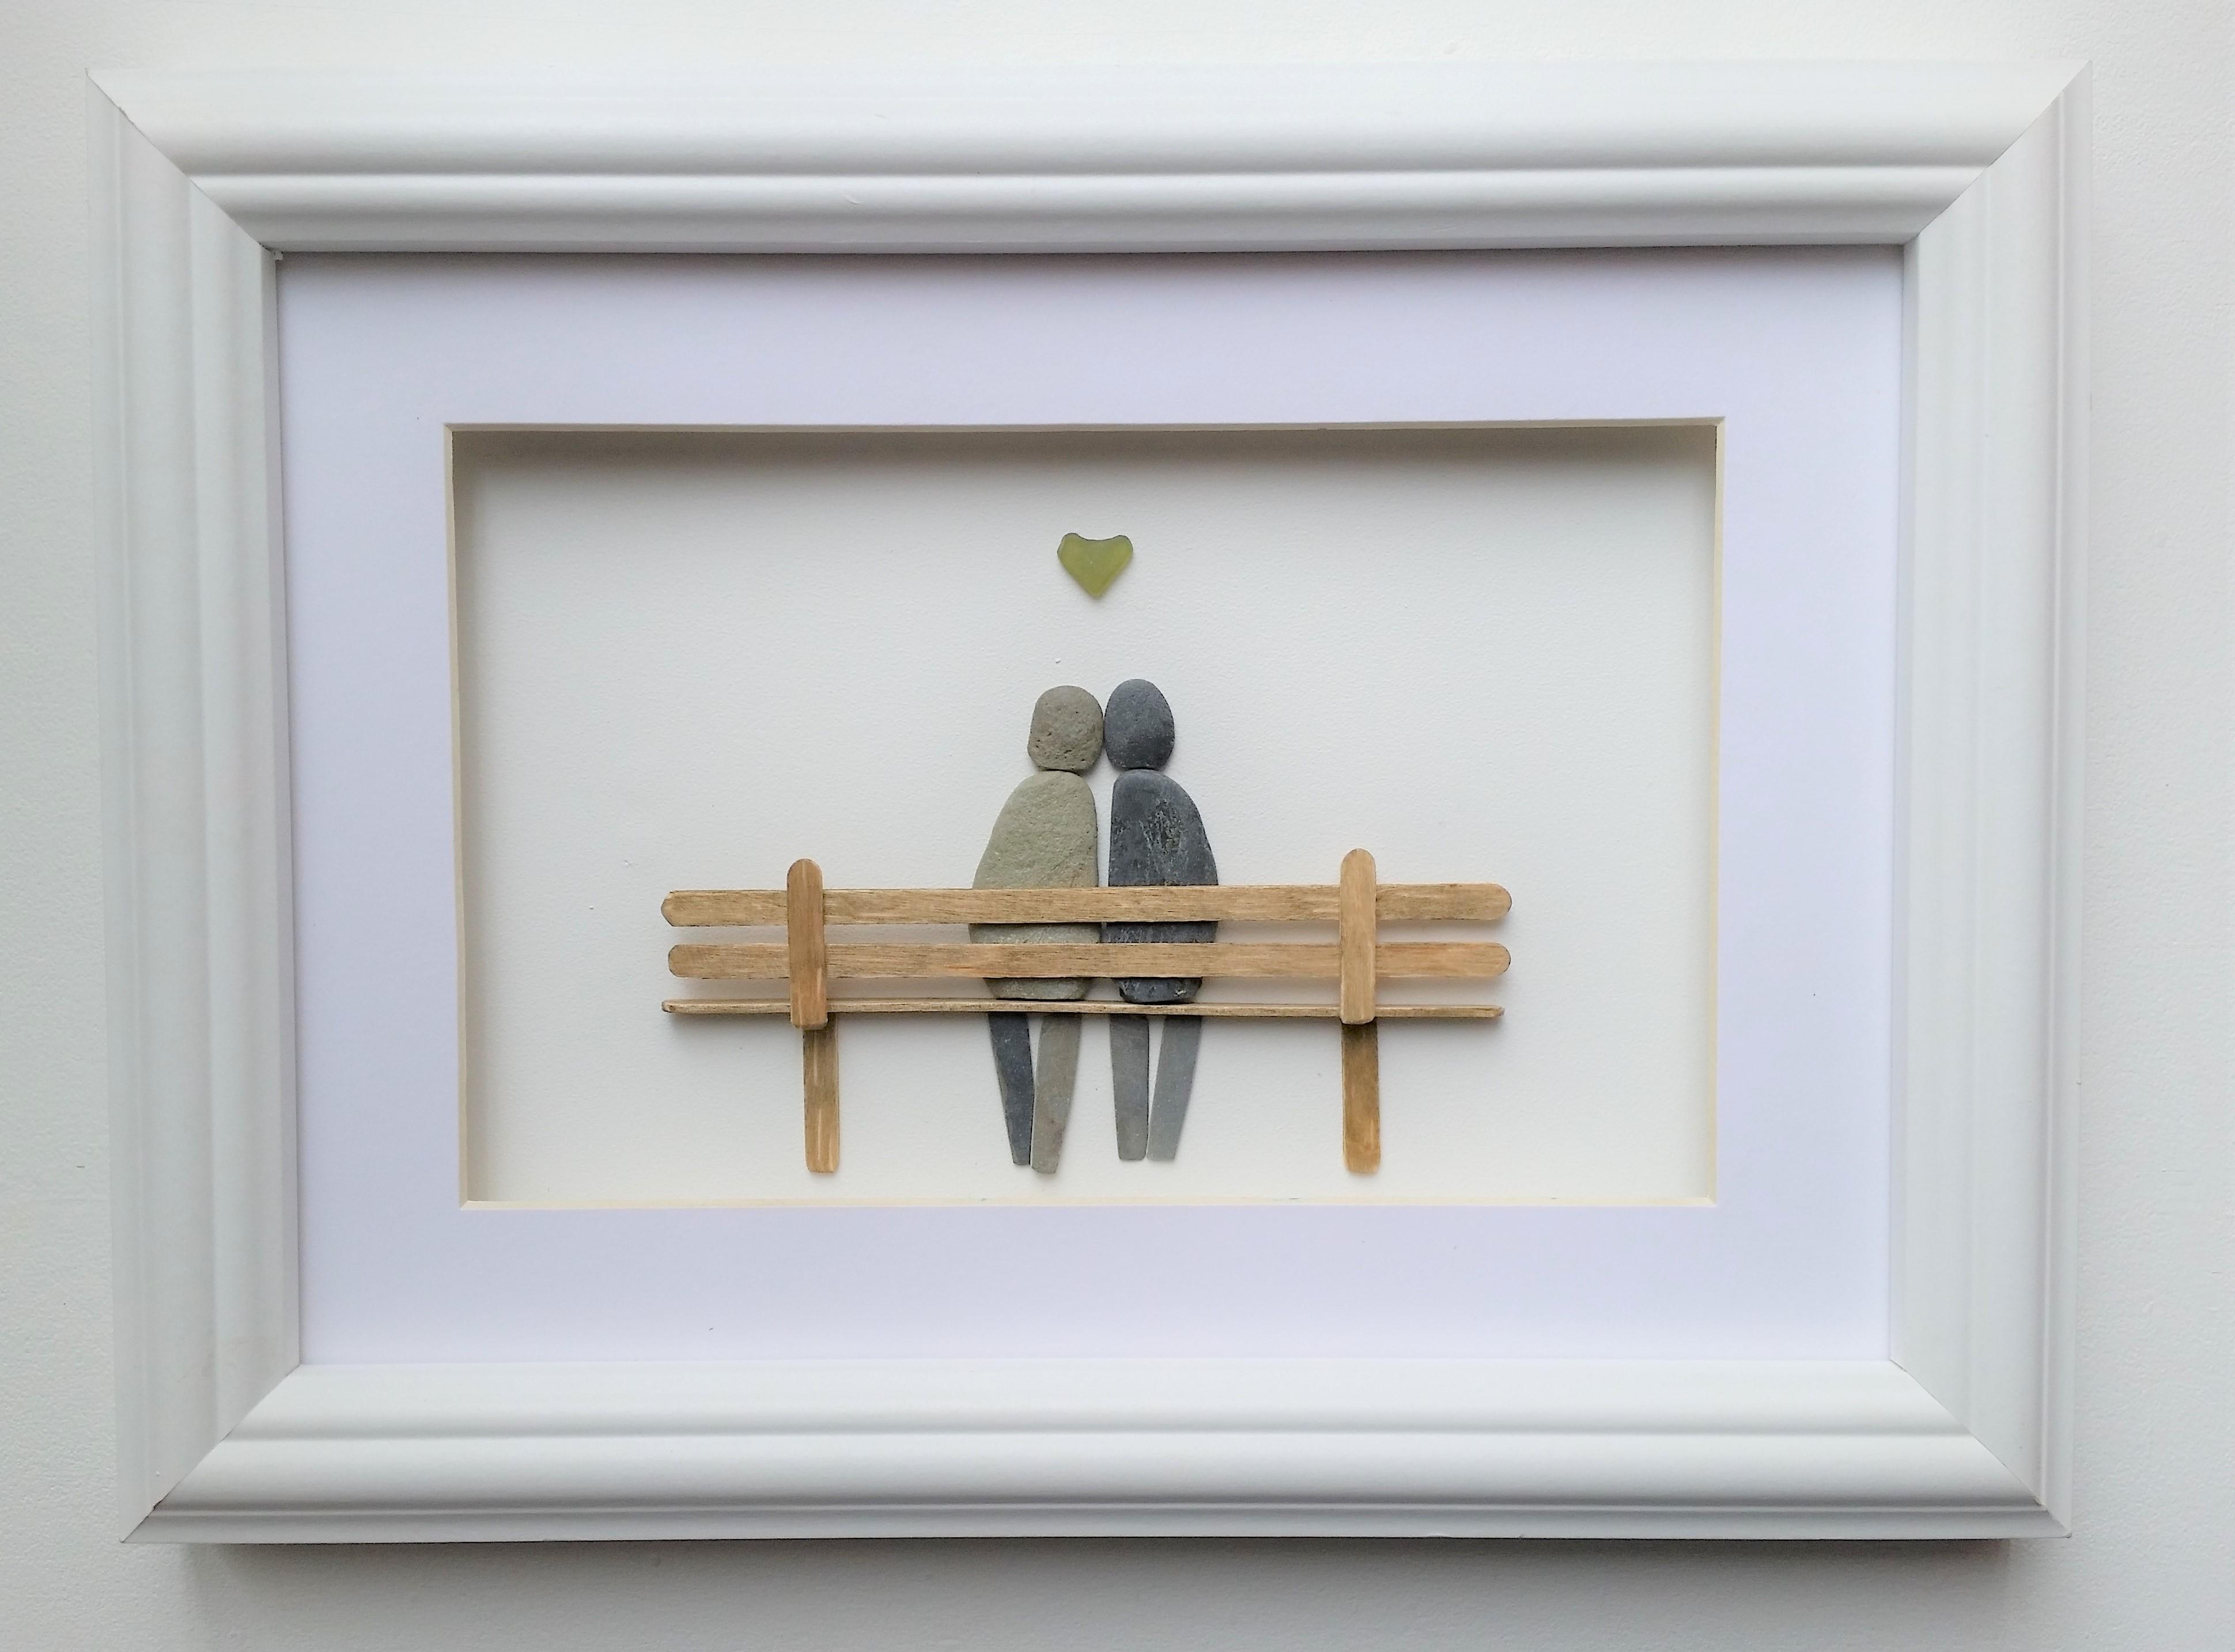 pebble couple on bench